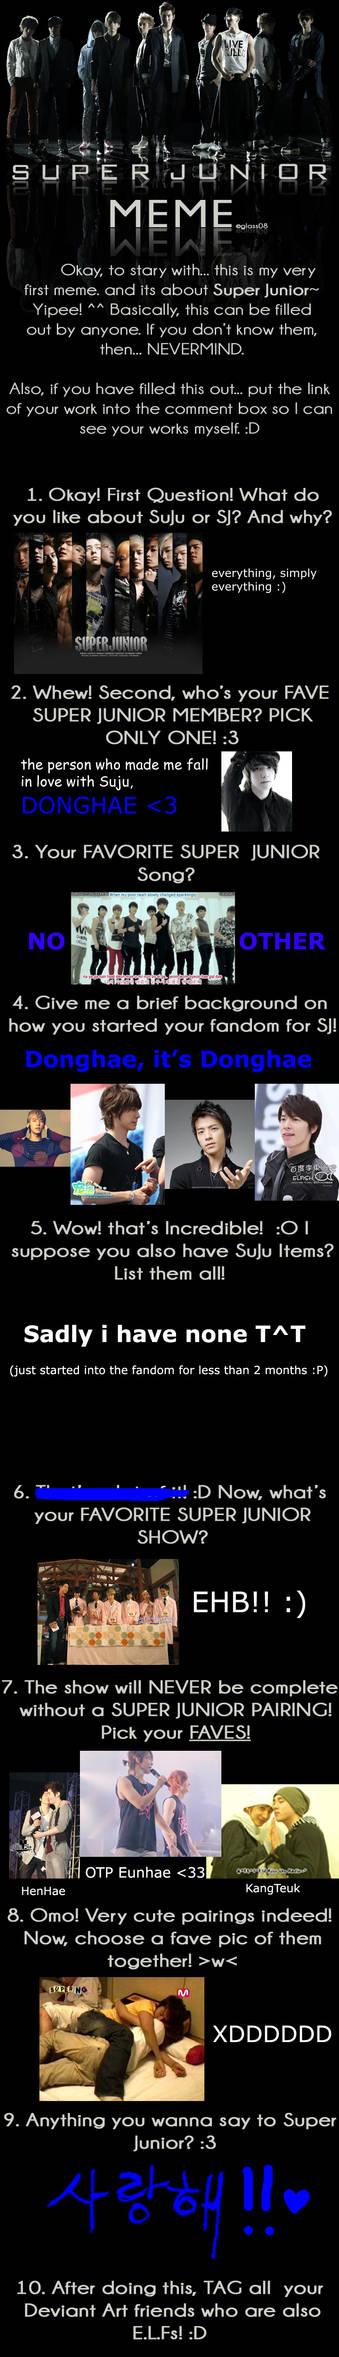 Super Junior ultimate meme XDD by LOLzLover on DeviantArt